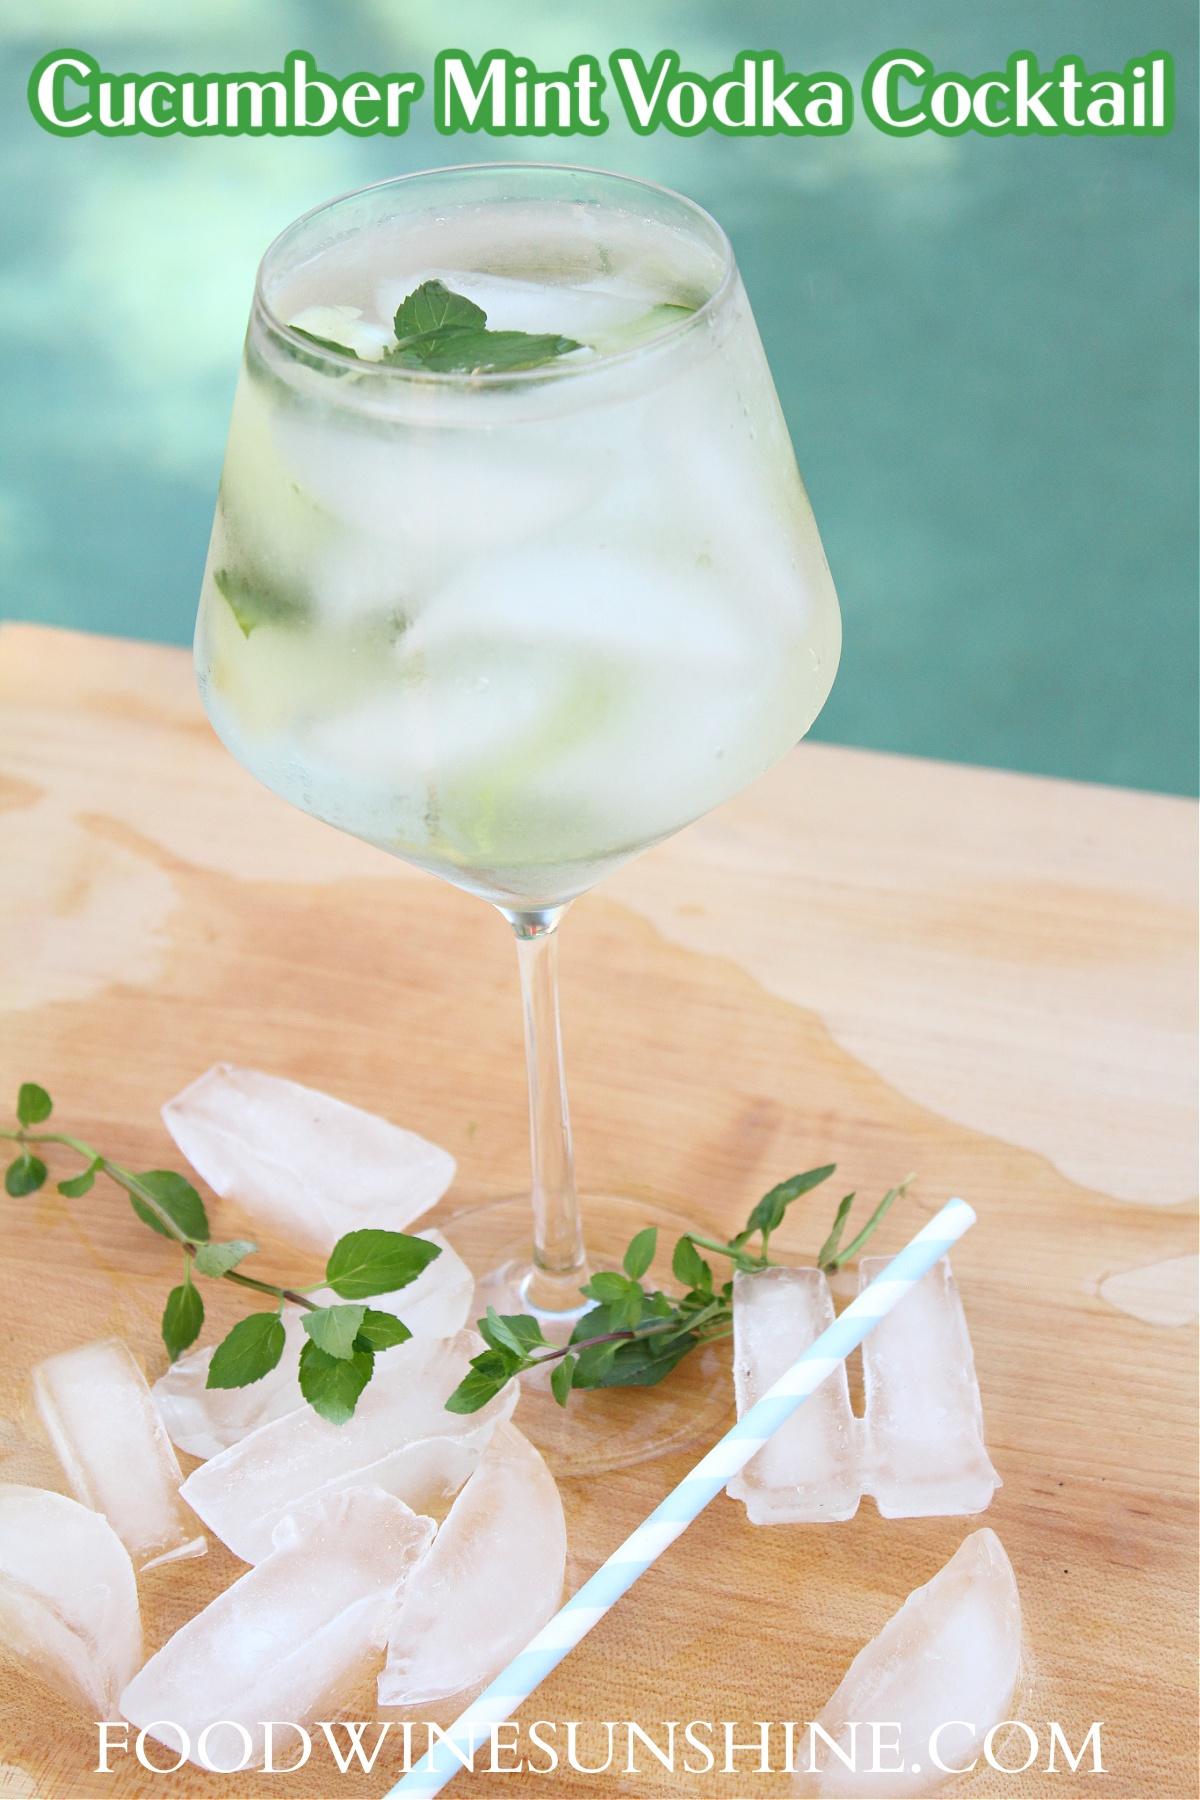 Best Cucumber Mint Vodka Cocktail